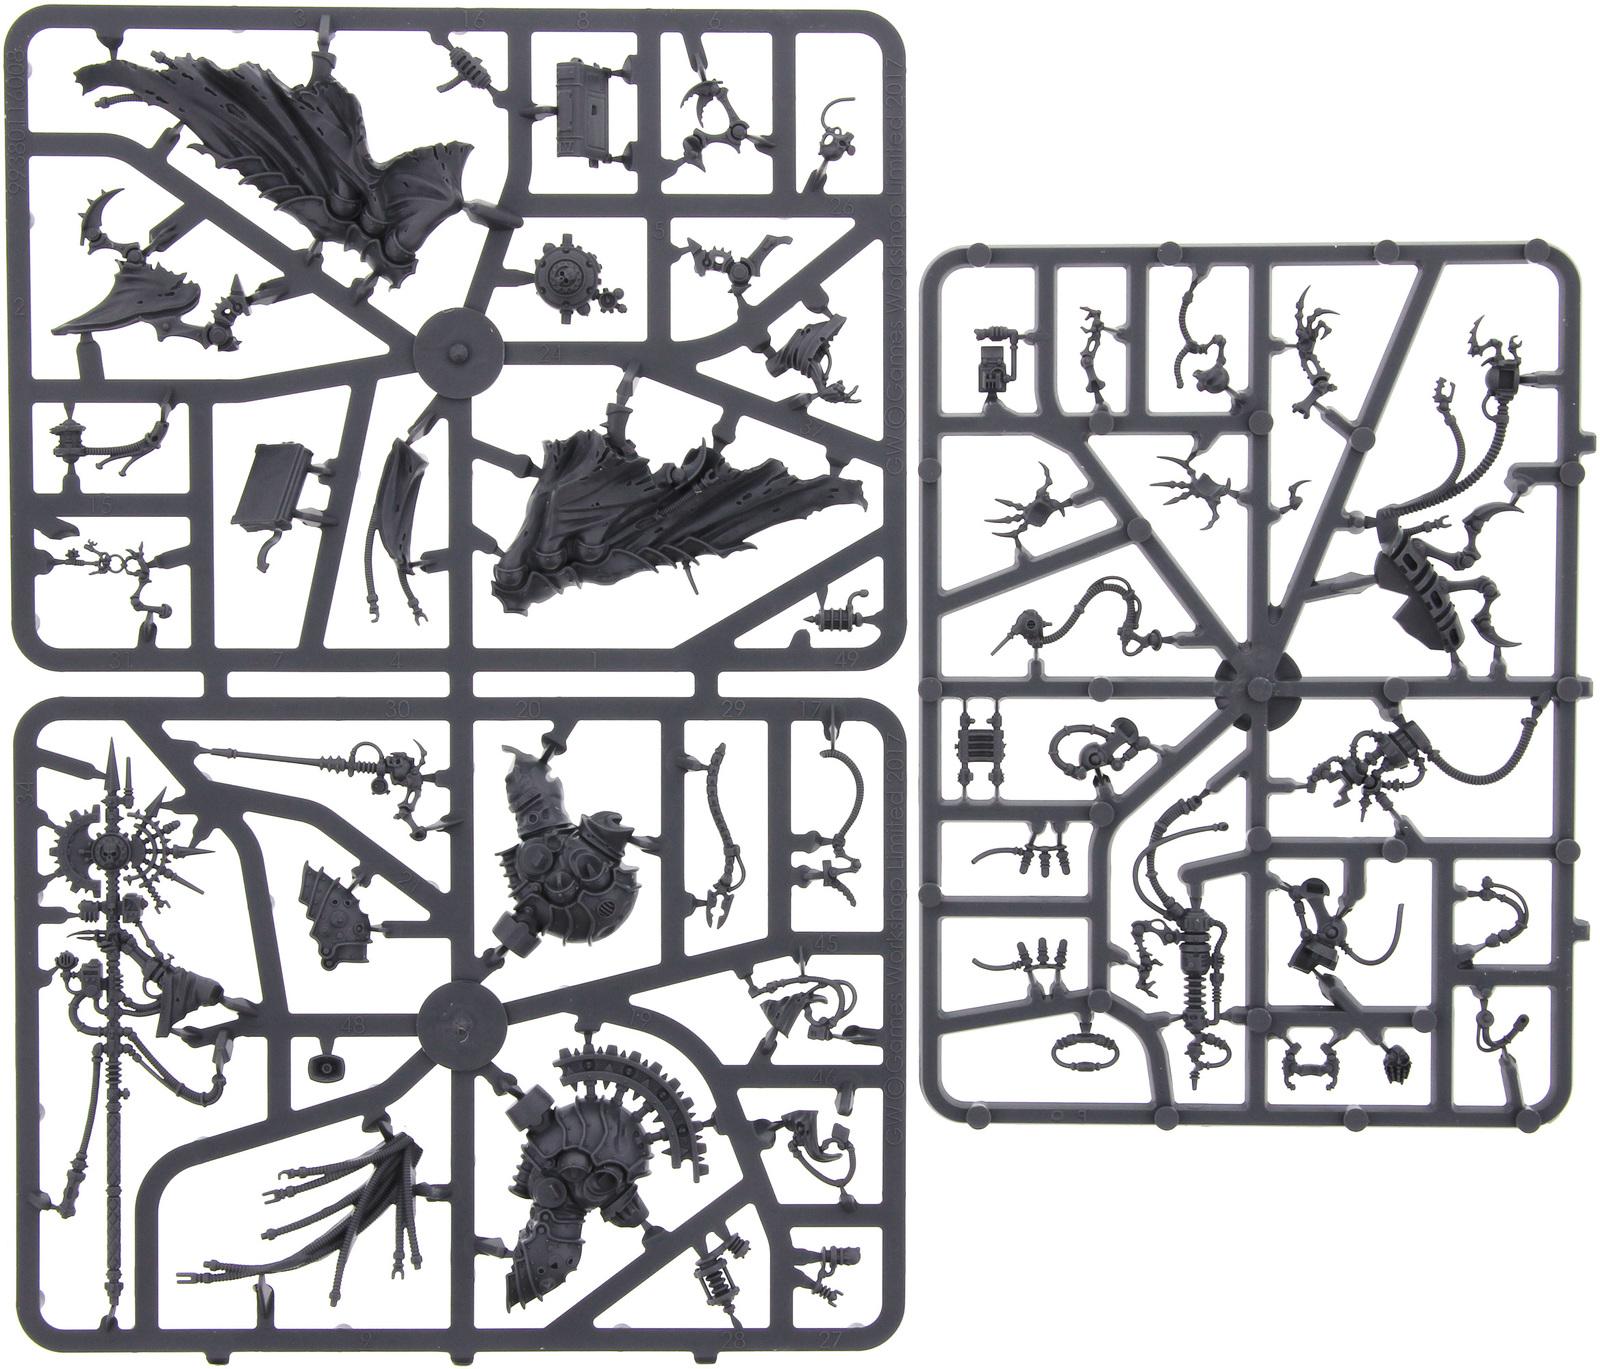 Warhammer 40,000: Adeptus Mechanicus Belisarius Cawl image